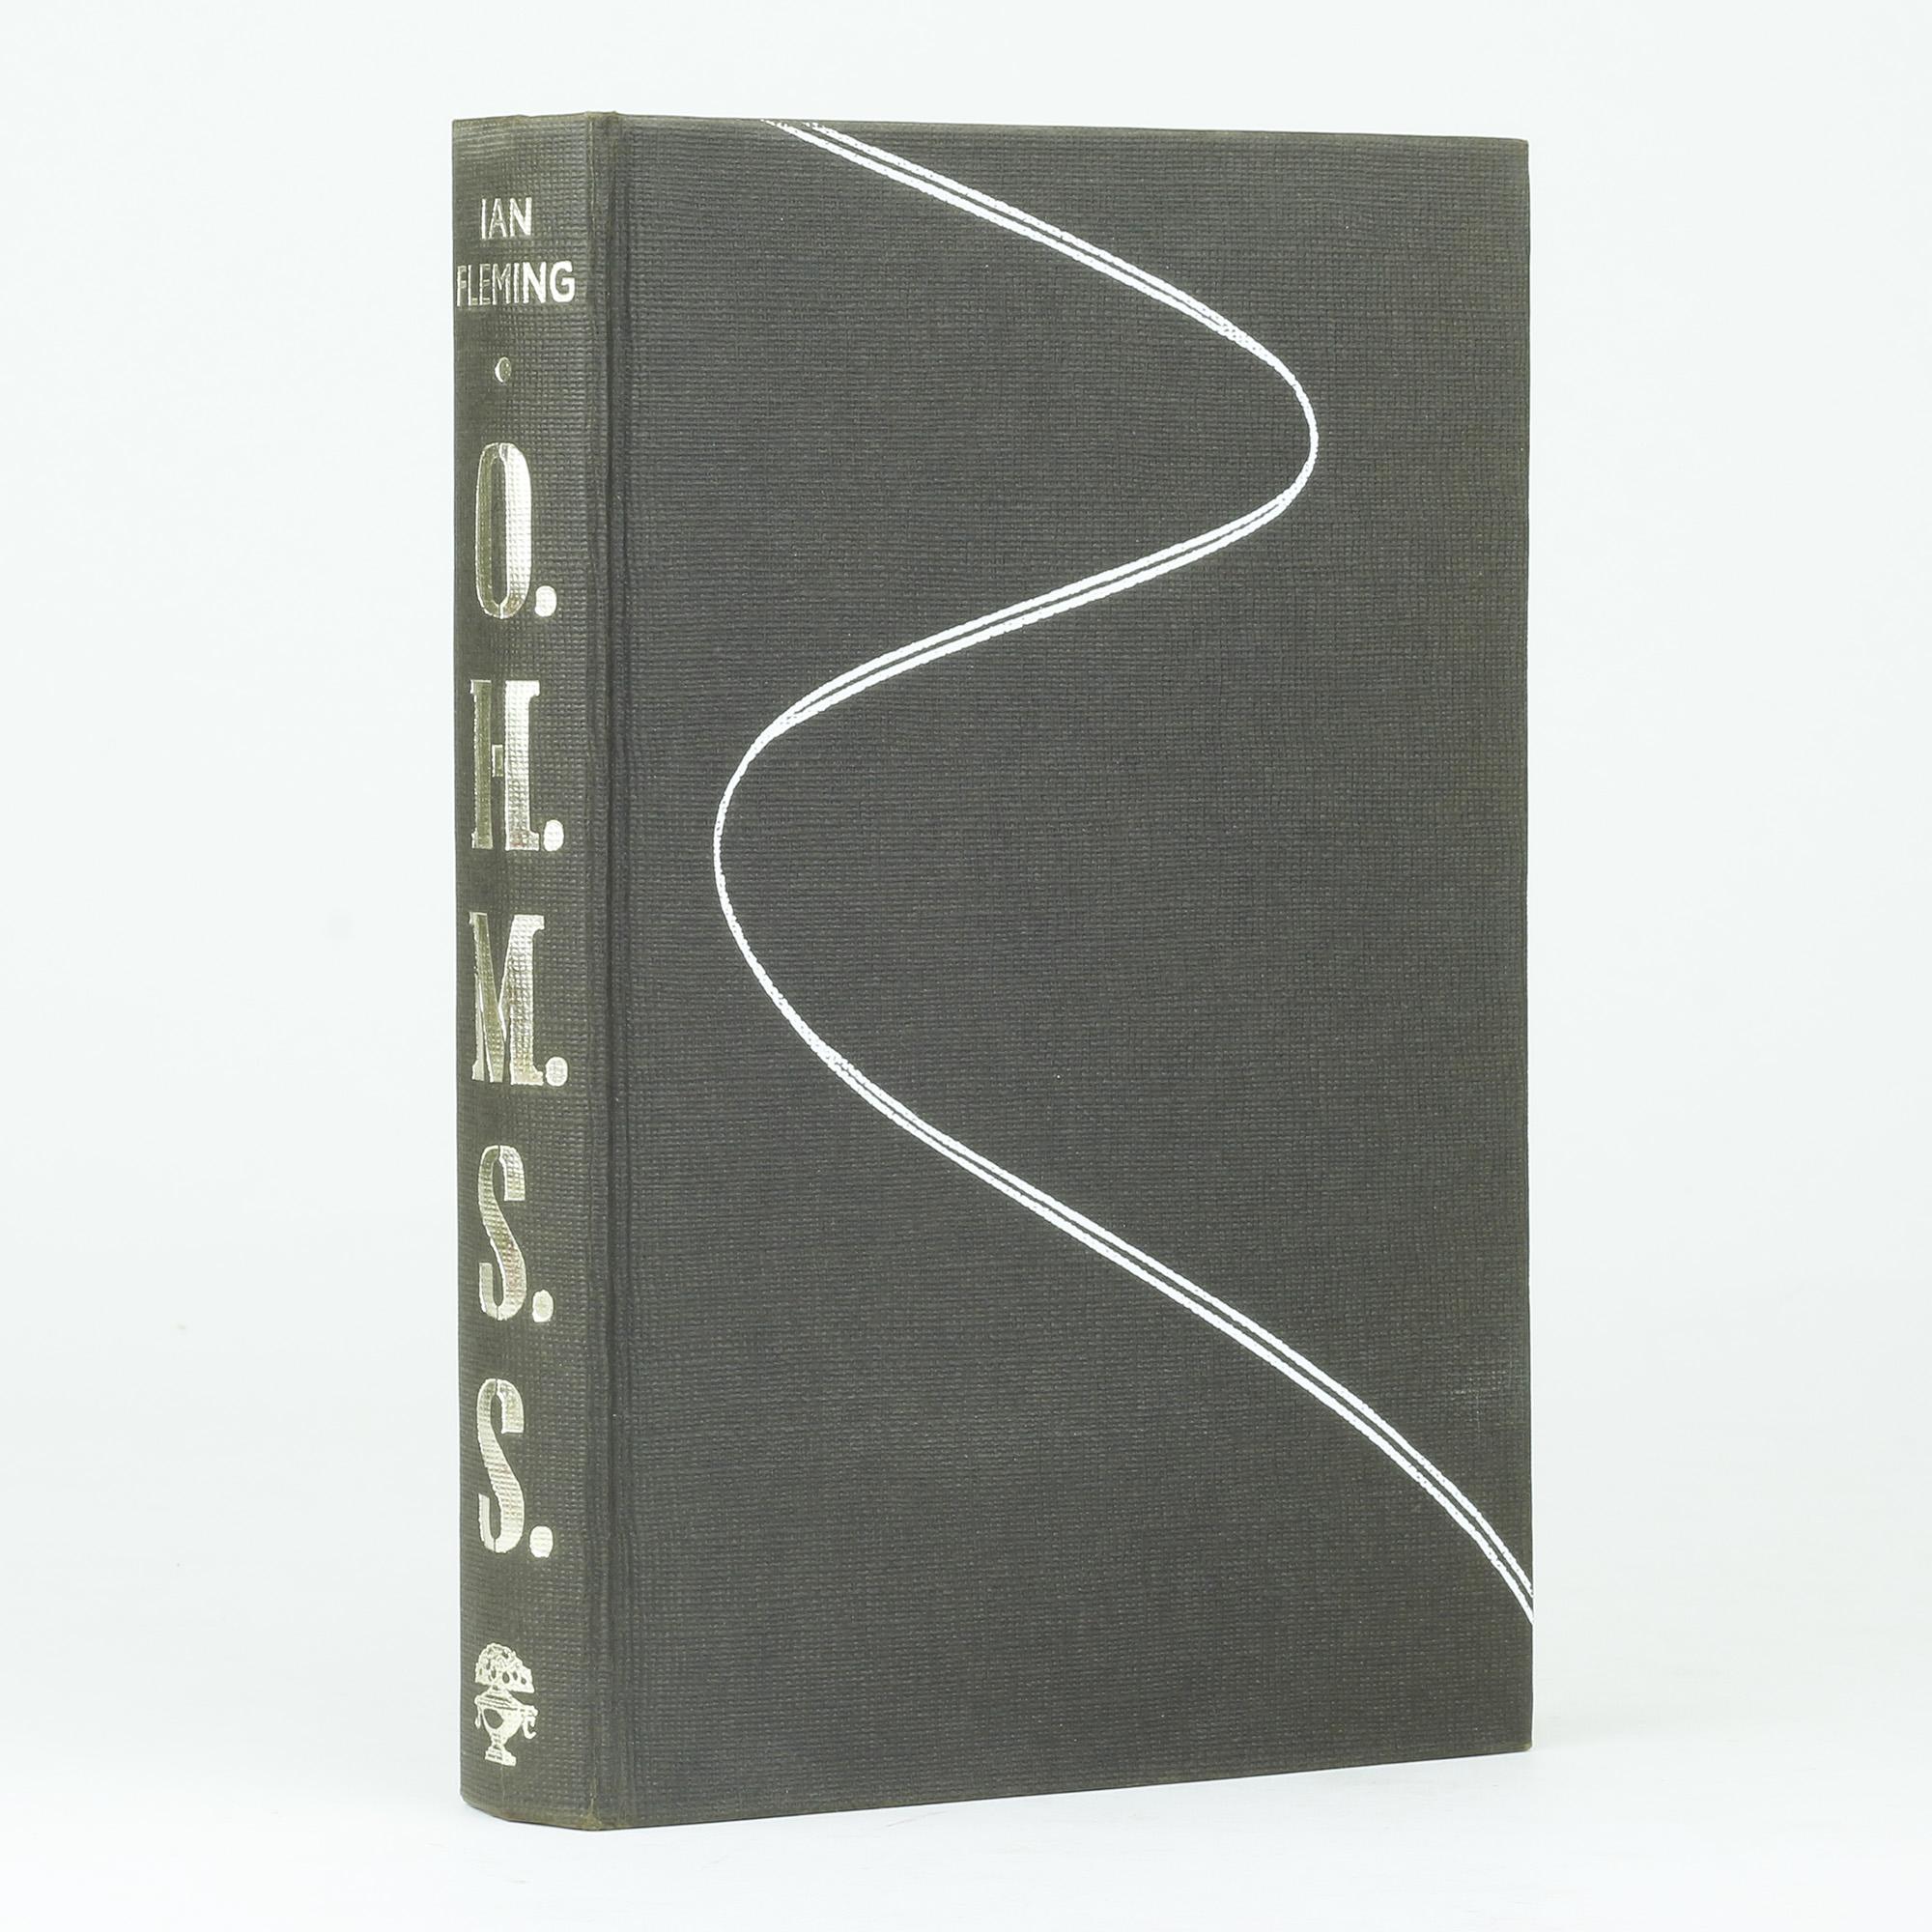 IAN FLEMING - ON HER MAJESTY'S SECRET SERVICE -1st EDITION (1963)